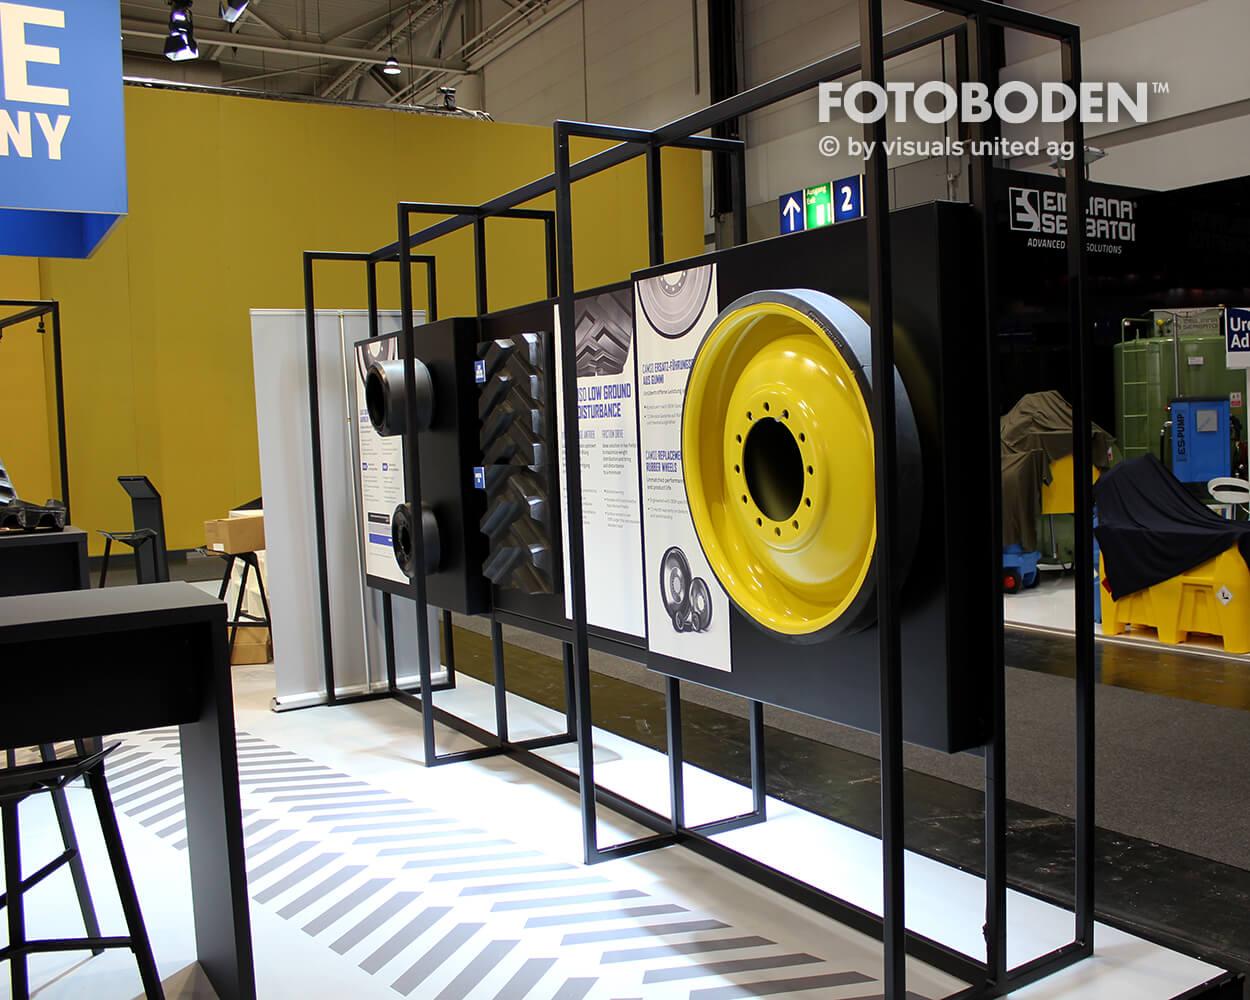 Camso 4 Fotoboden Messeboden Tradeshow Flooring Bodengestaltung Messe Bodendesign Messedesign Design Boden Messegestaltung